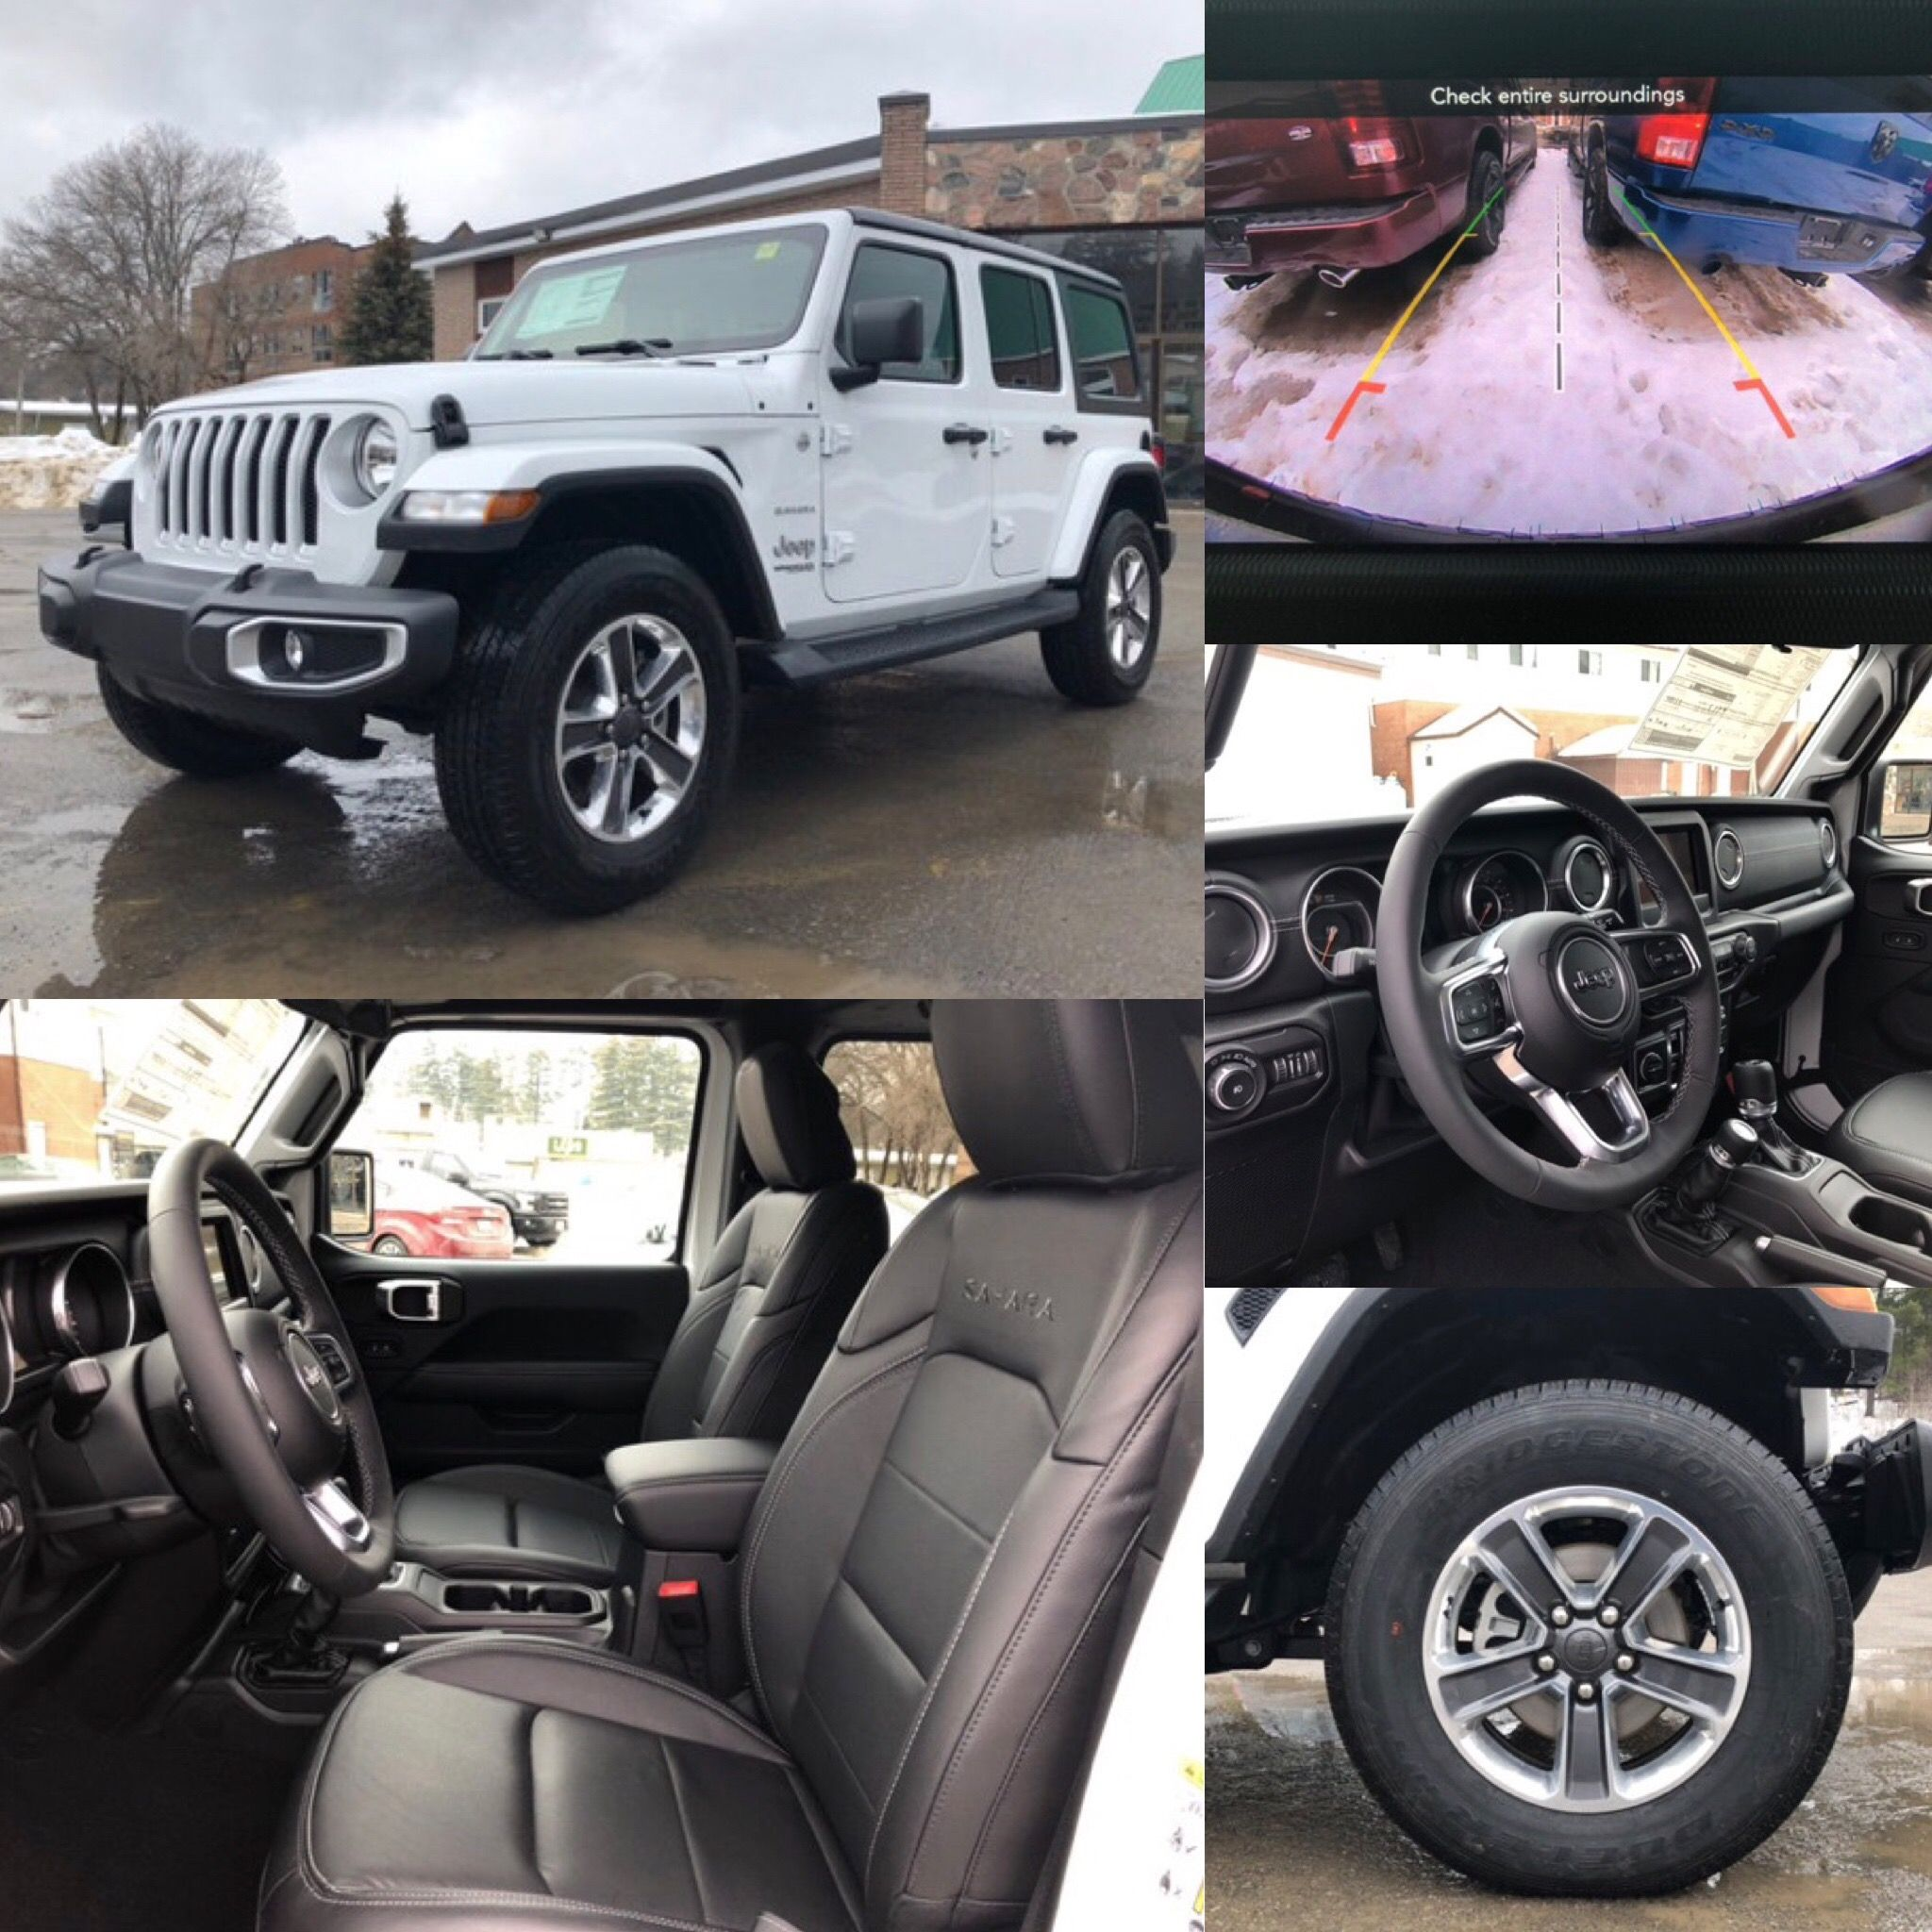 2018 Bright White Jeep Wrangler Unlimited Sahara 4x4 Leather Htd Seats And Jeep Wrangler Unlimited Sahara Wrangler Unlimited Sahara Jeep Wrangler Unlimited